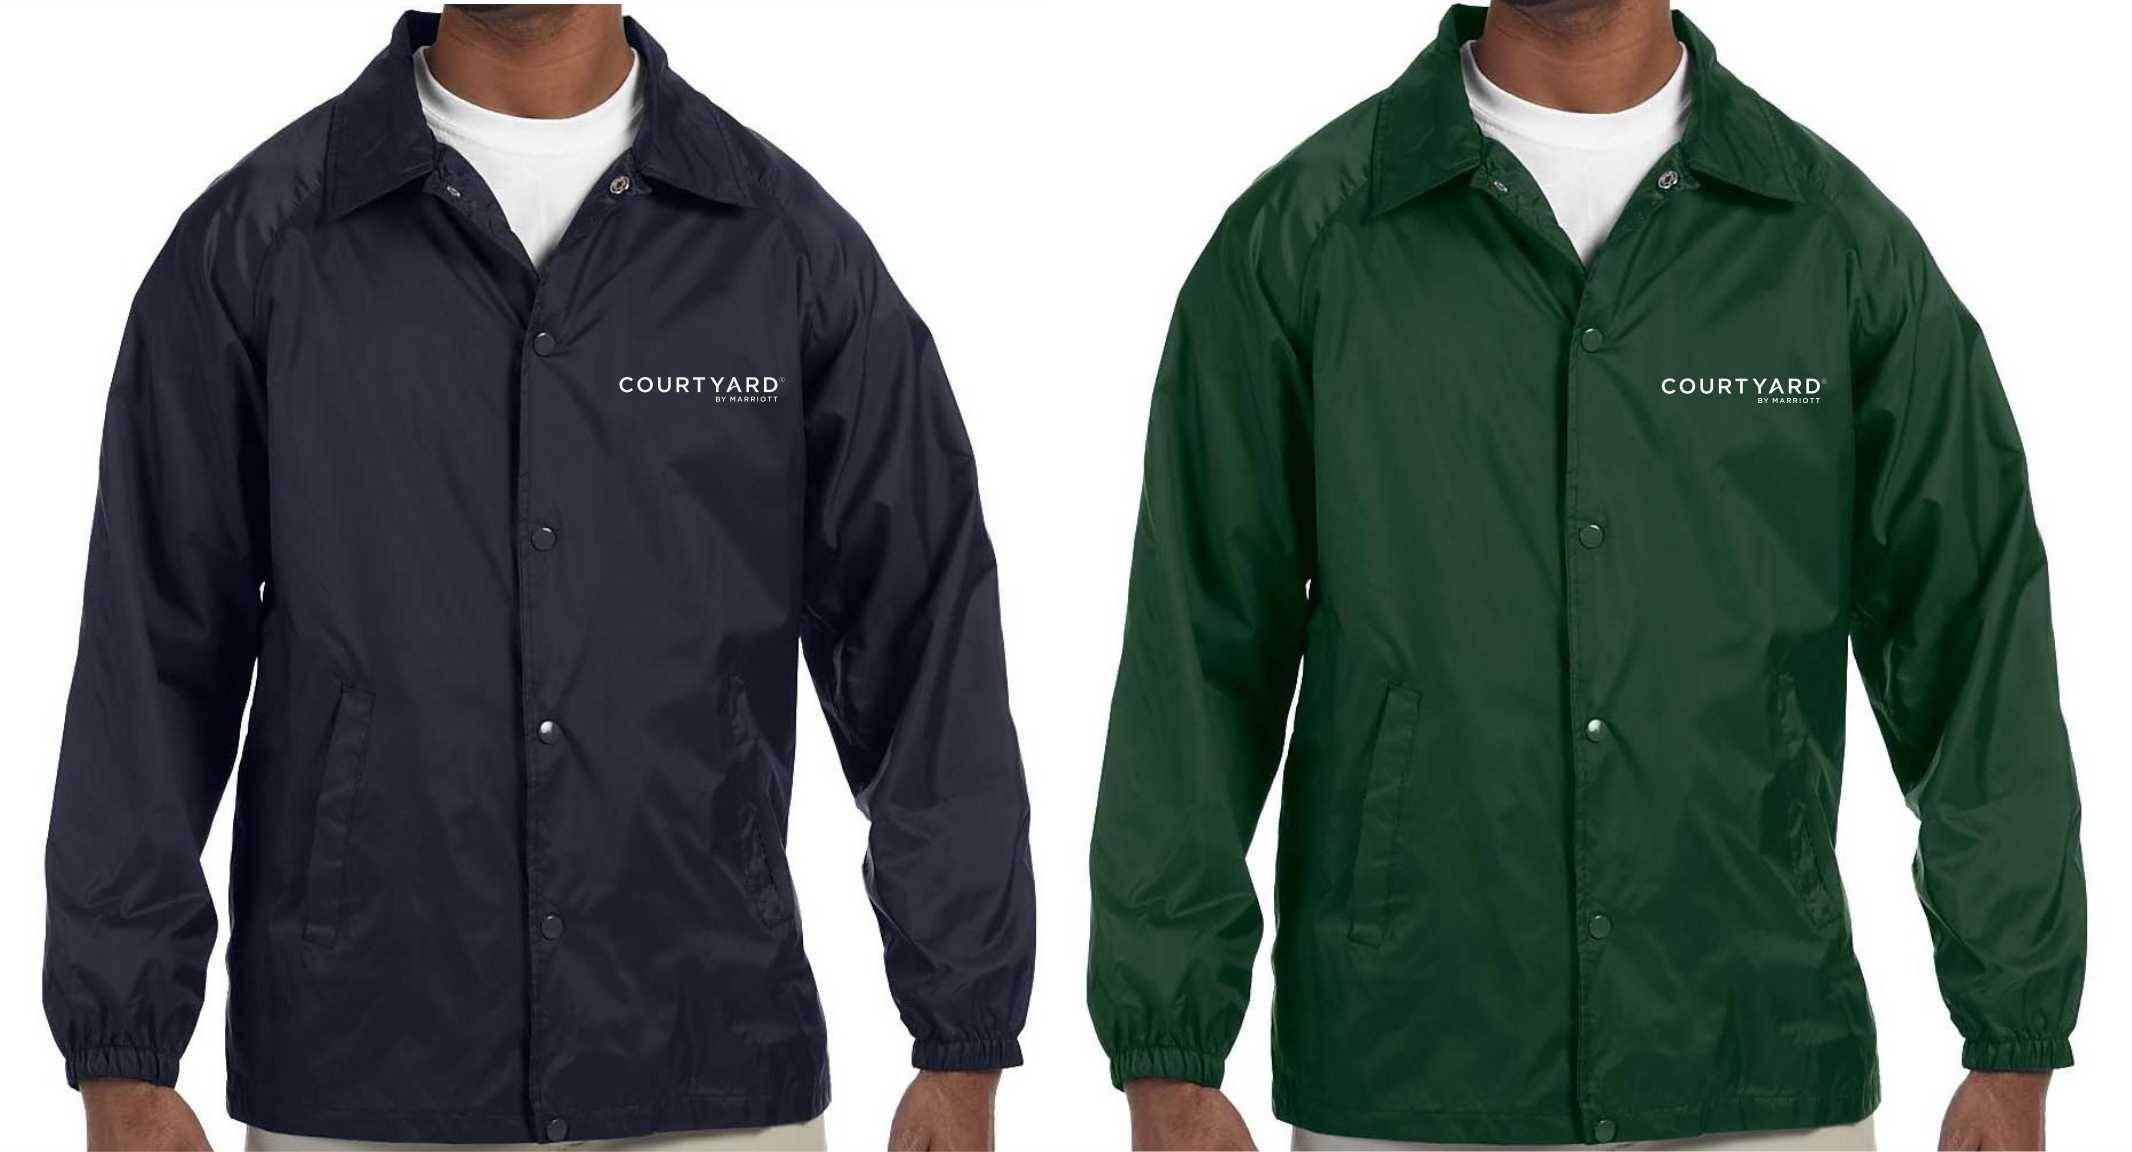 Lined Jackets | Silk-Screen Logo | Nylon Shell | Polyester Lining | Elastic Cuffs